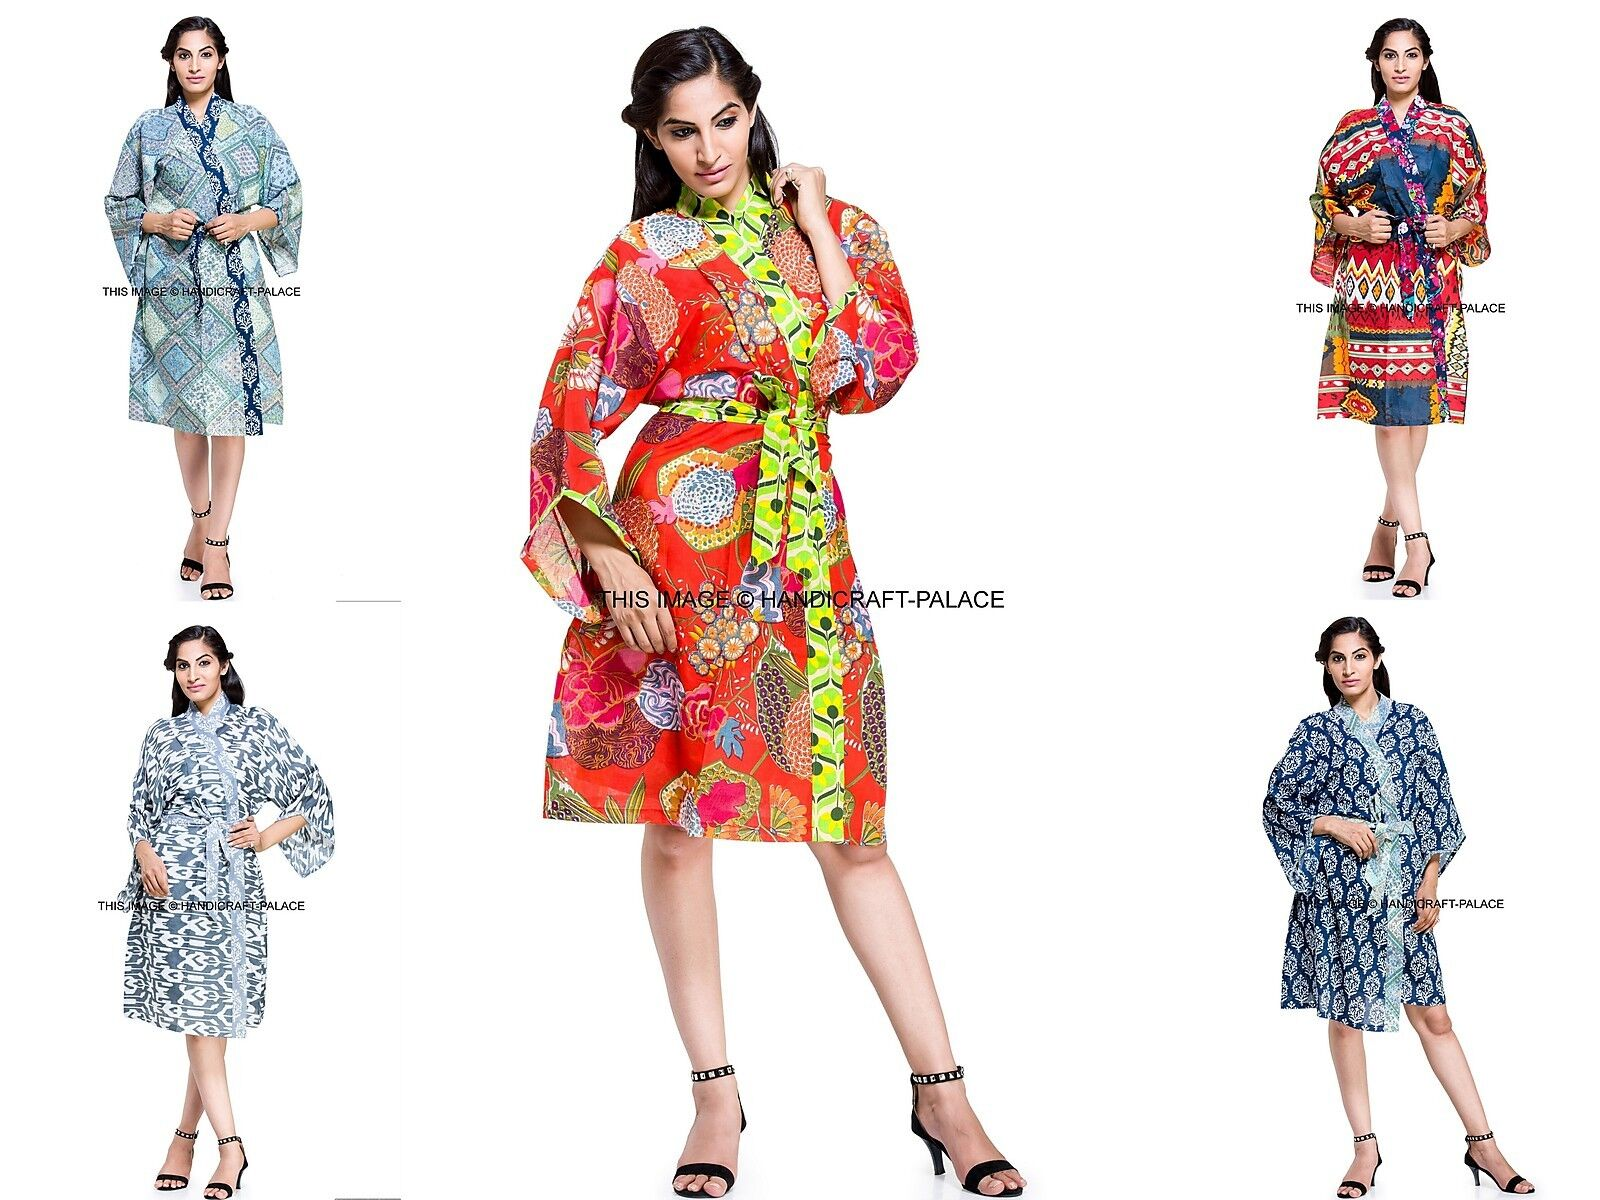 5 pcs Wholesale Lot Indian Cotton Kimono Short Nightgown Hippie Bath Robe Dress